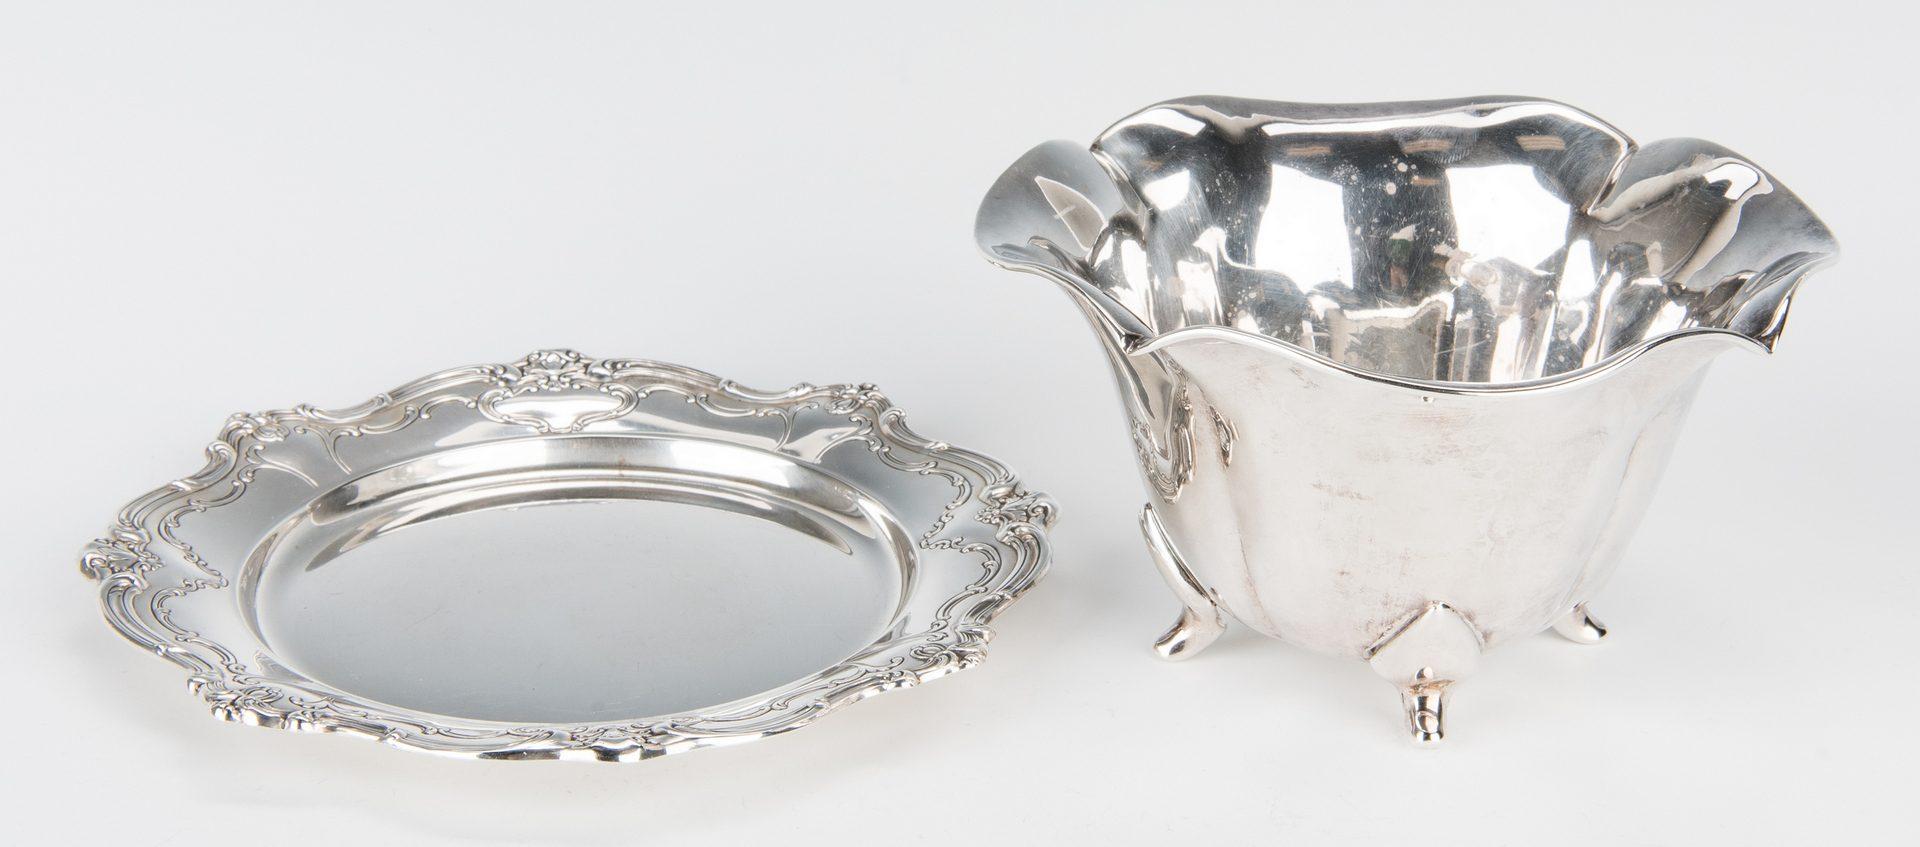 Lot 159: Group Sterling Silver Tableware & Flatware, 34 Pcs.